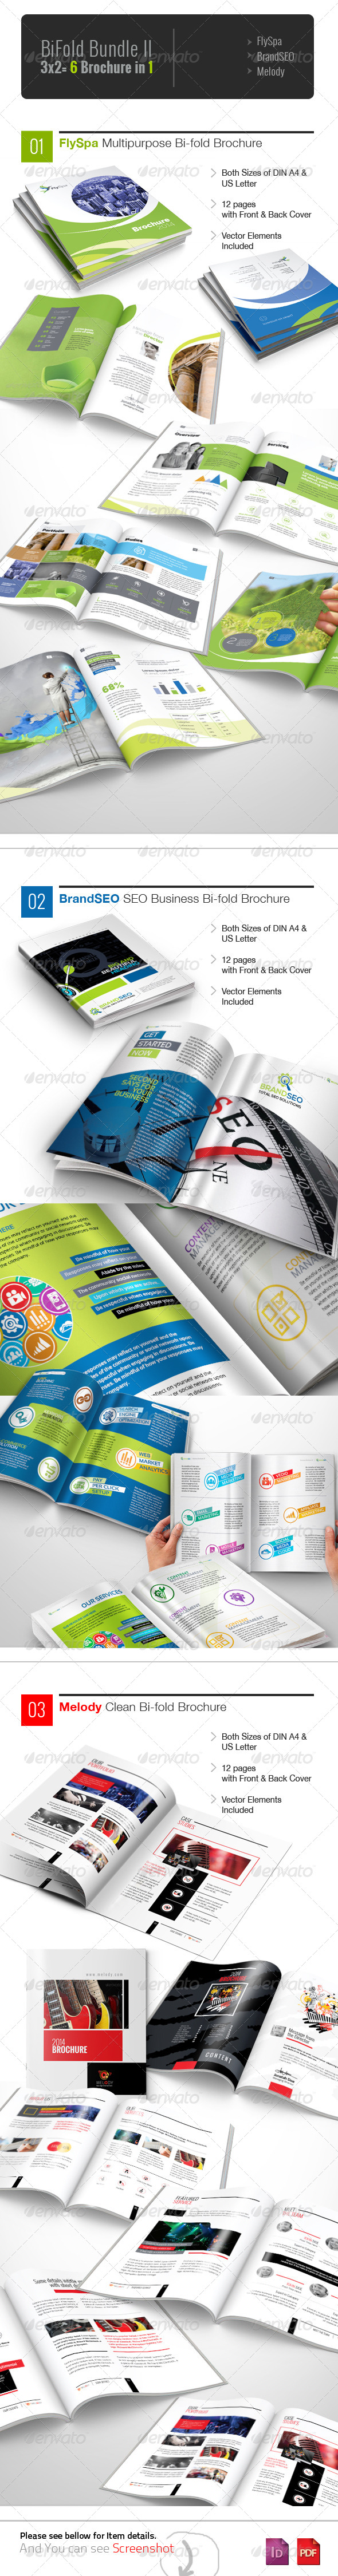 GraphicRiver Corporate Bifold Brochure Bundle II 5904715